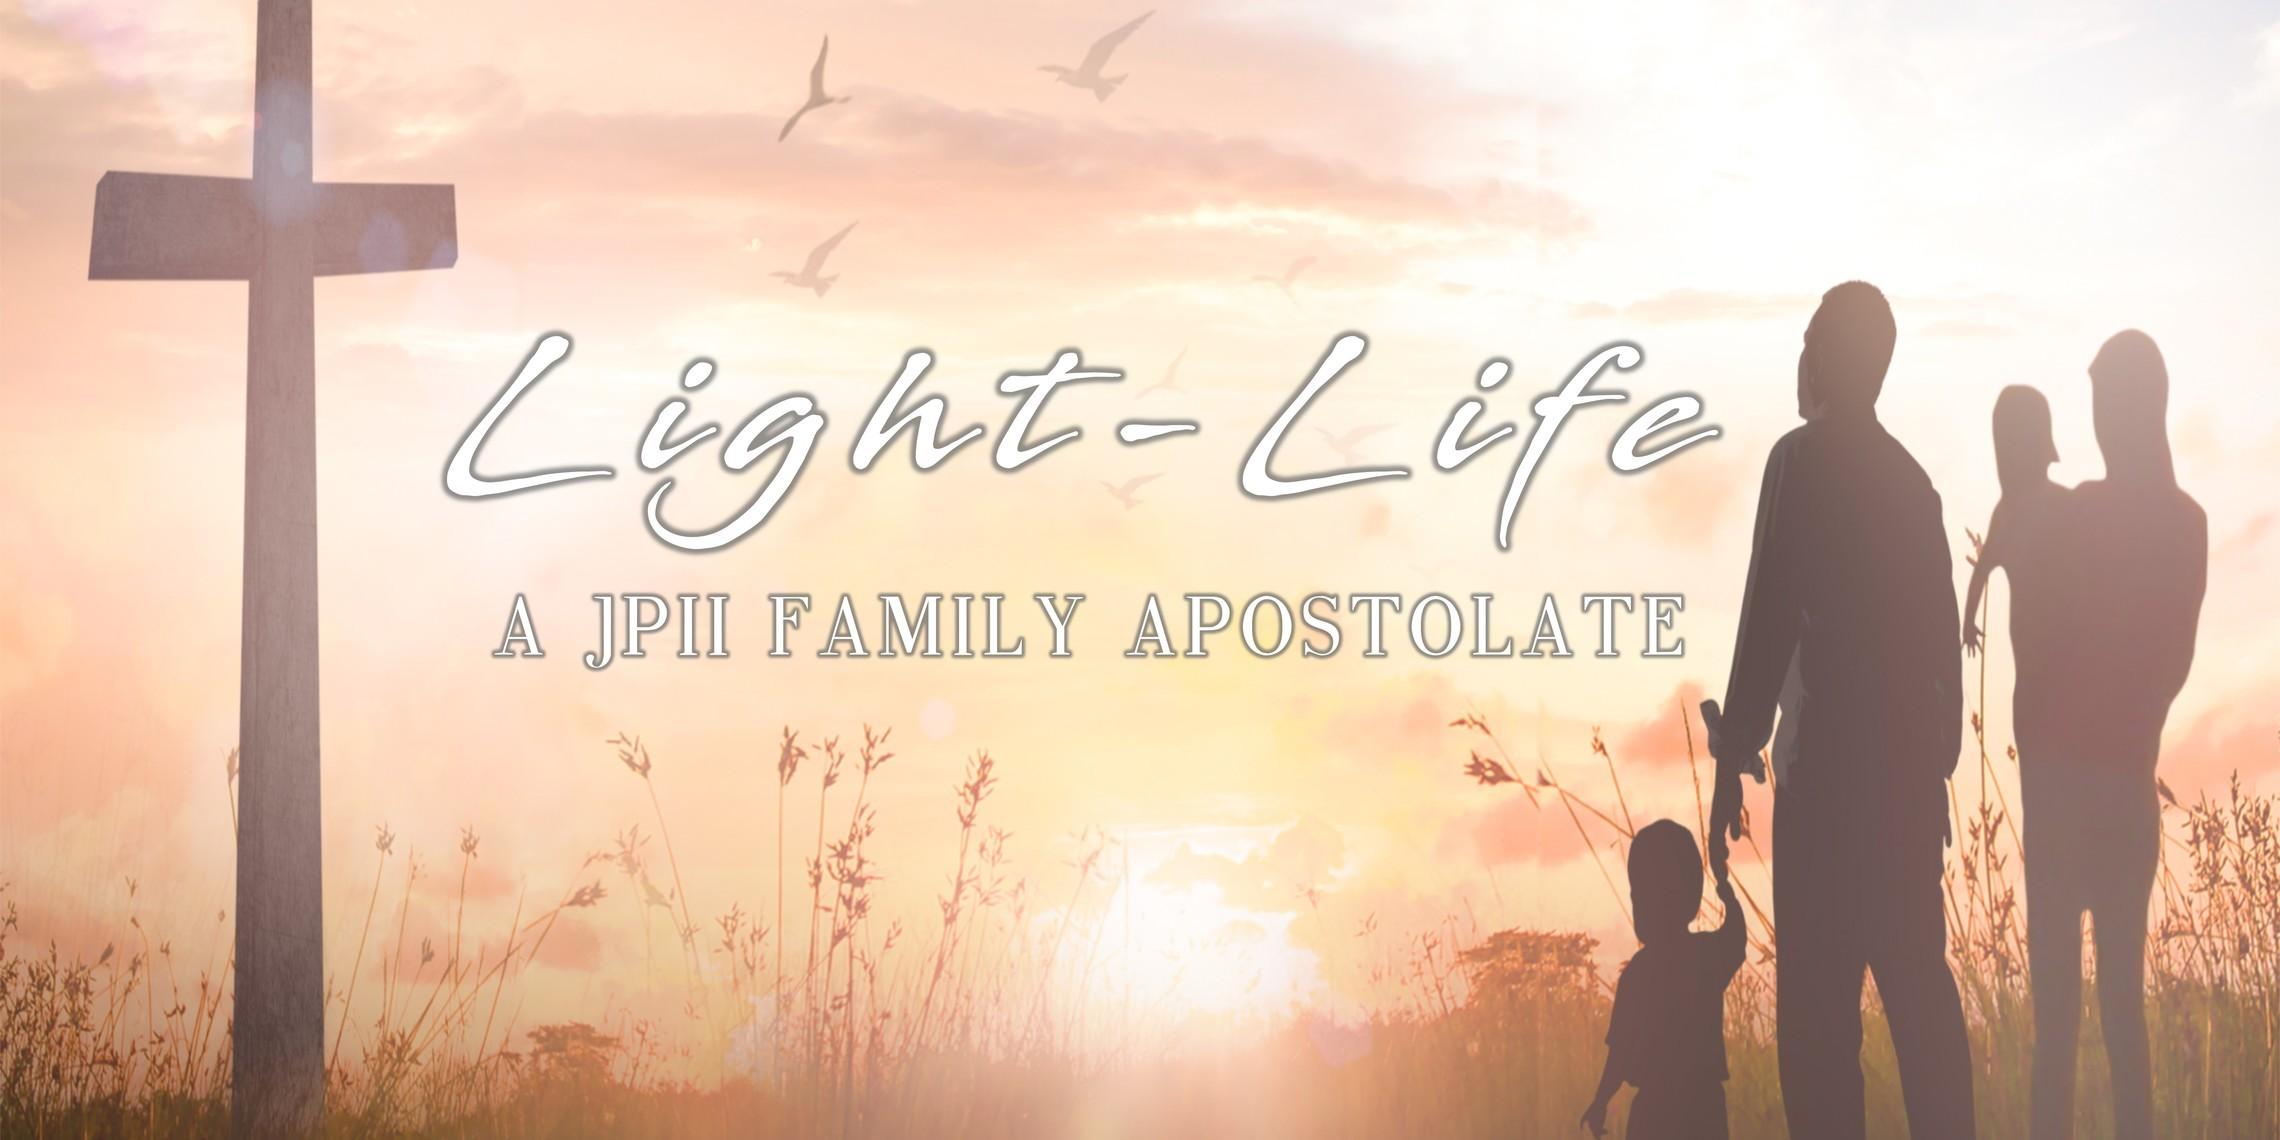 Light-Life photo button